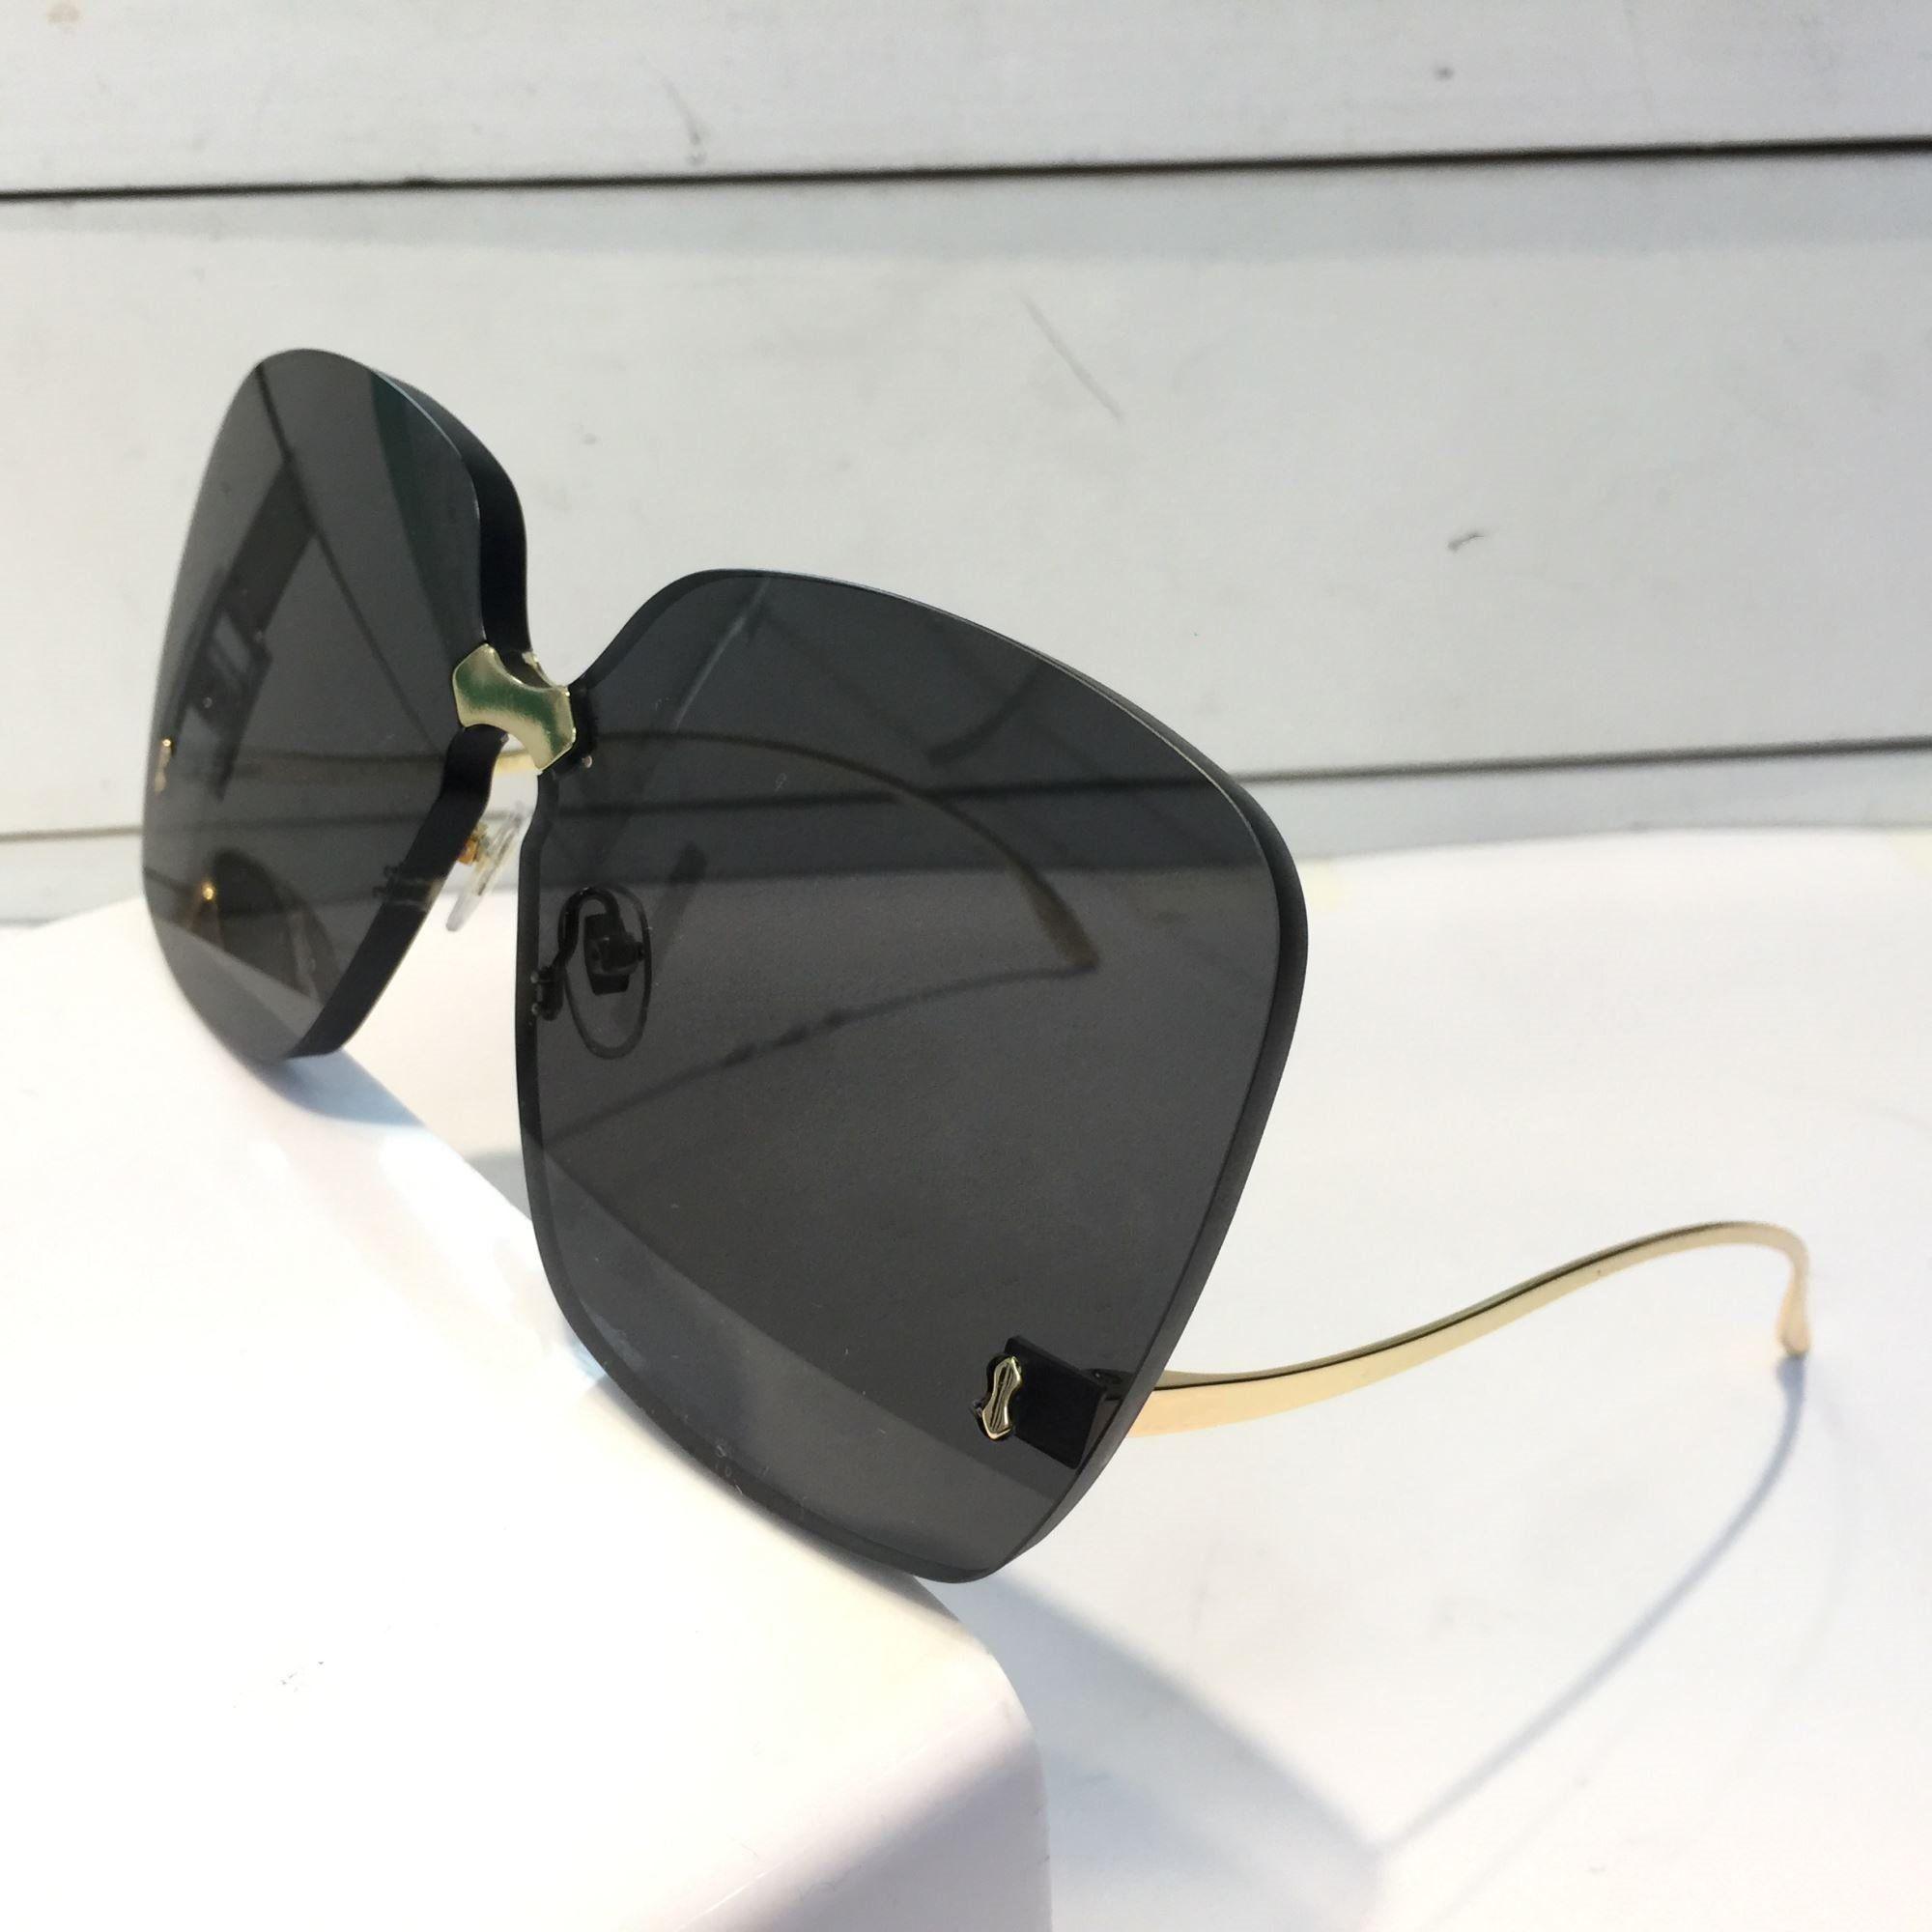 0352 Designer Sonnenbrillen für Frauen Mode-Verpackungs-Sunglass Frameless Beschichtung Spiegel-Objektiv-Carbon-Faser-Legs-Sommer-Art hochwertige 0352S